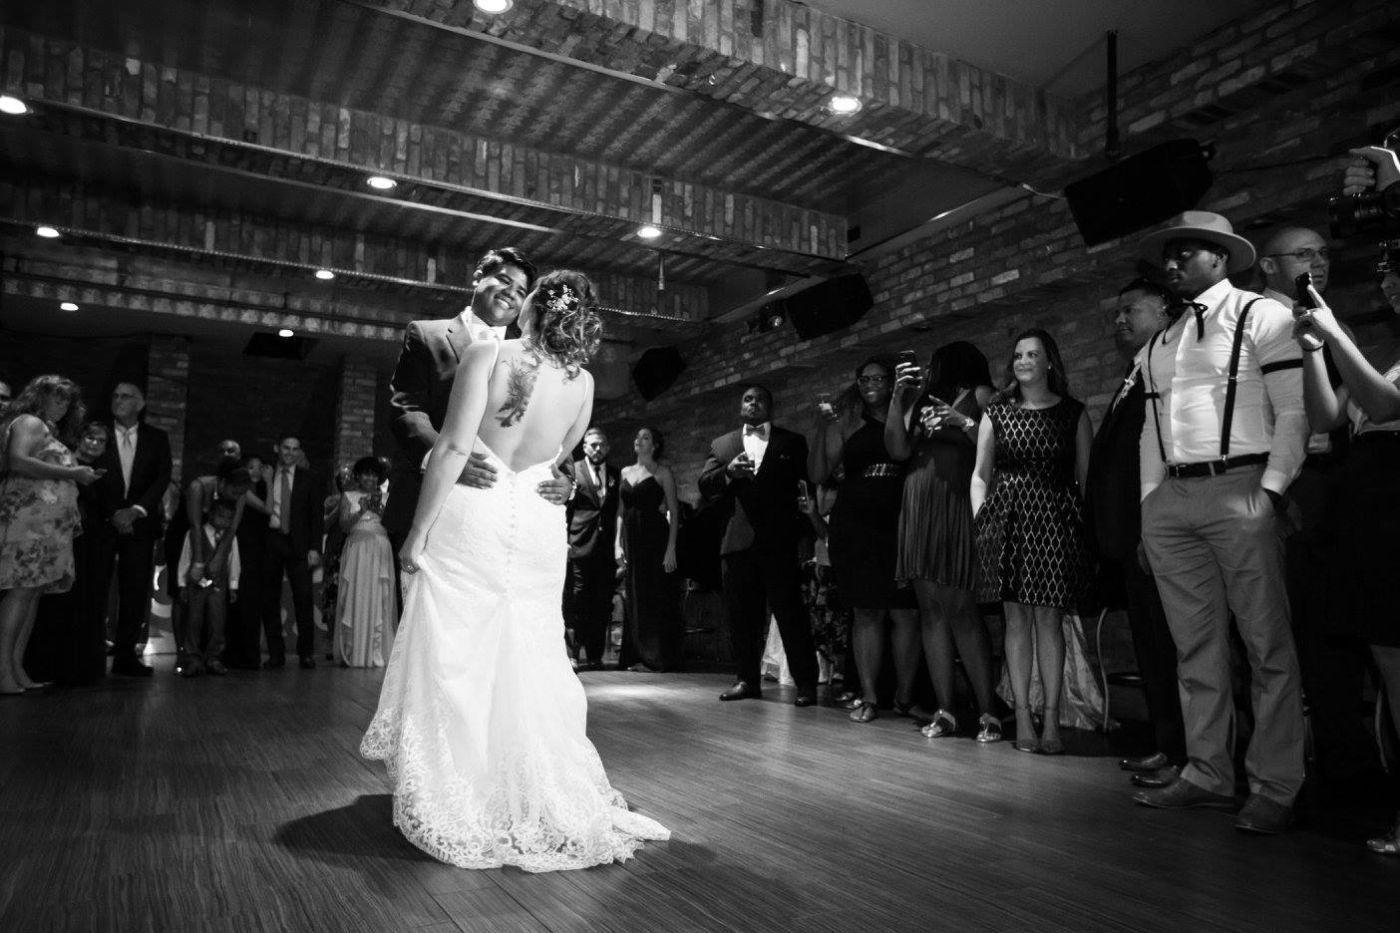 Deity brooklyn wedding venue sx studios deity brooklyn weddings deity brooklyn wedding venue sx studios junglespirit Image collections